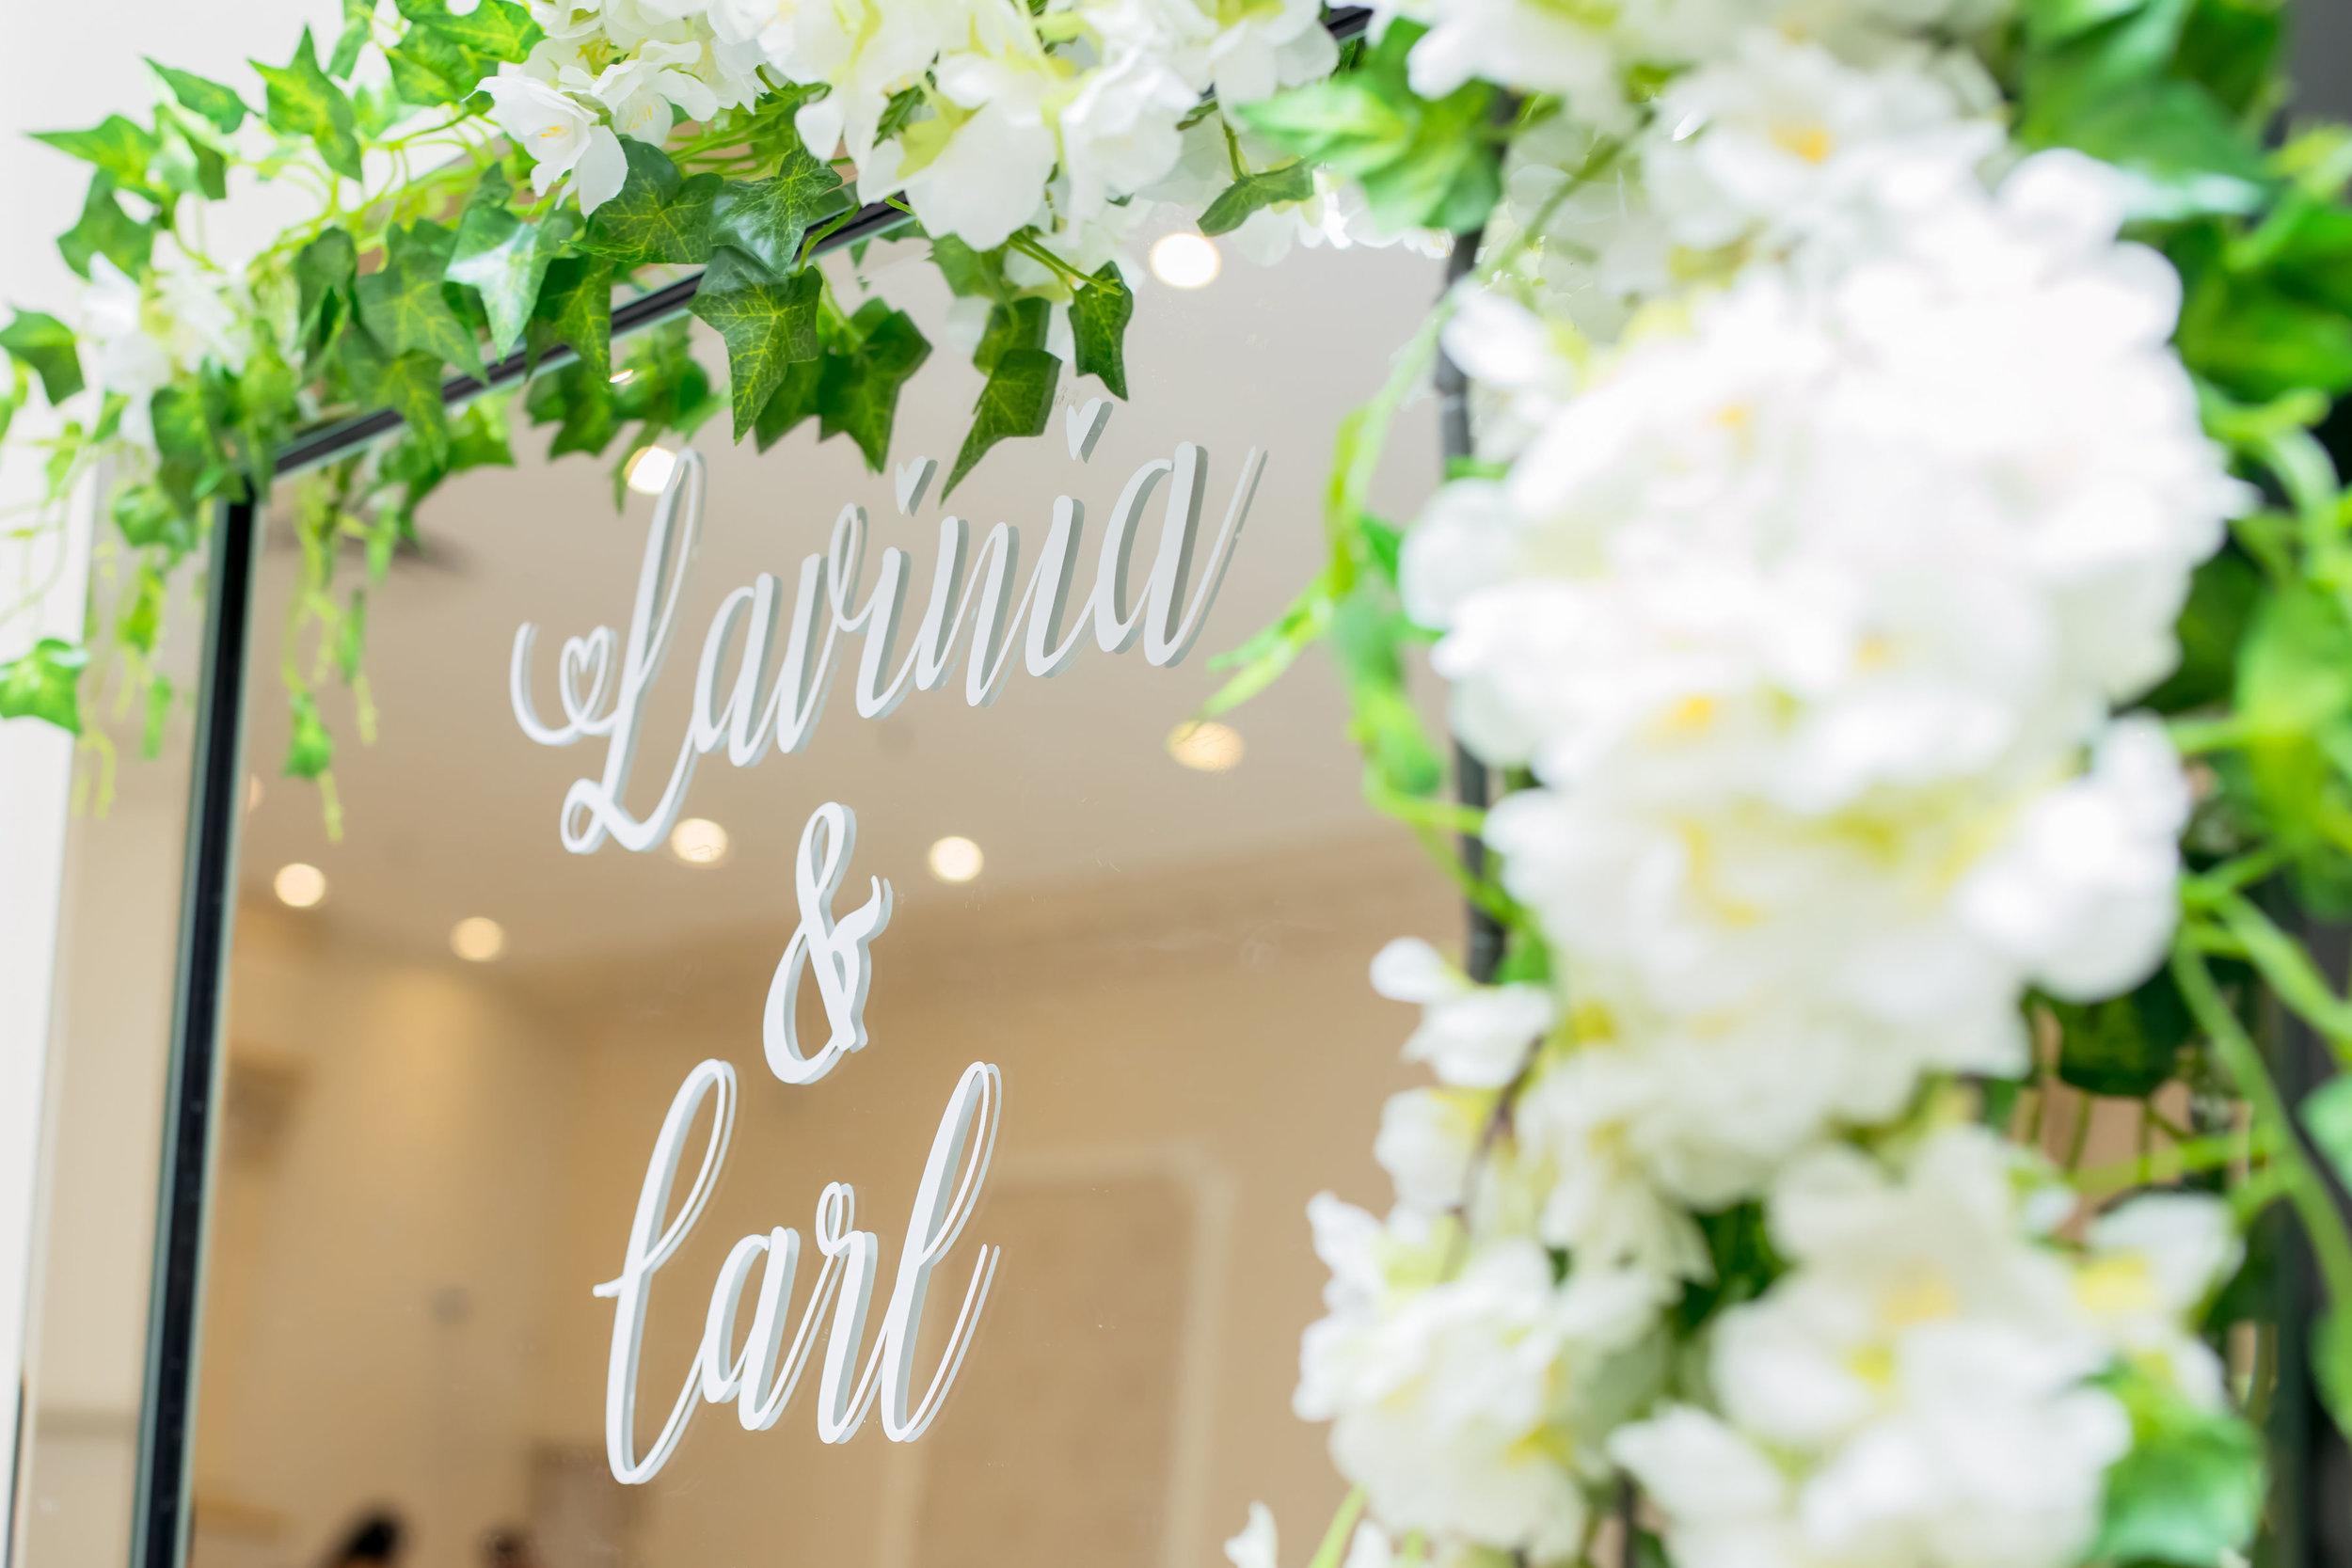 Karimah_Gheddai_Photography_Catholic_Wedding_Alexander_Muir_Gardens_Paradise_Banquet_Hall_Caligraphy